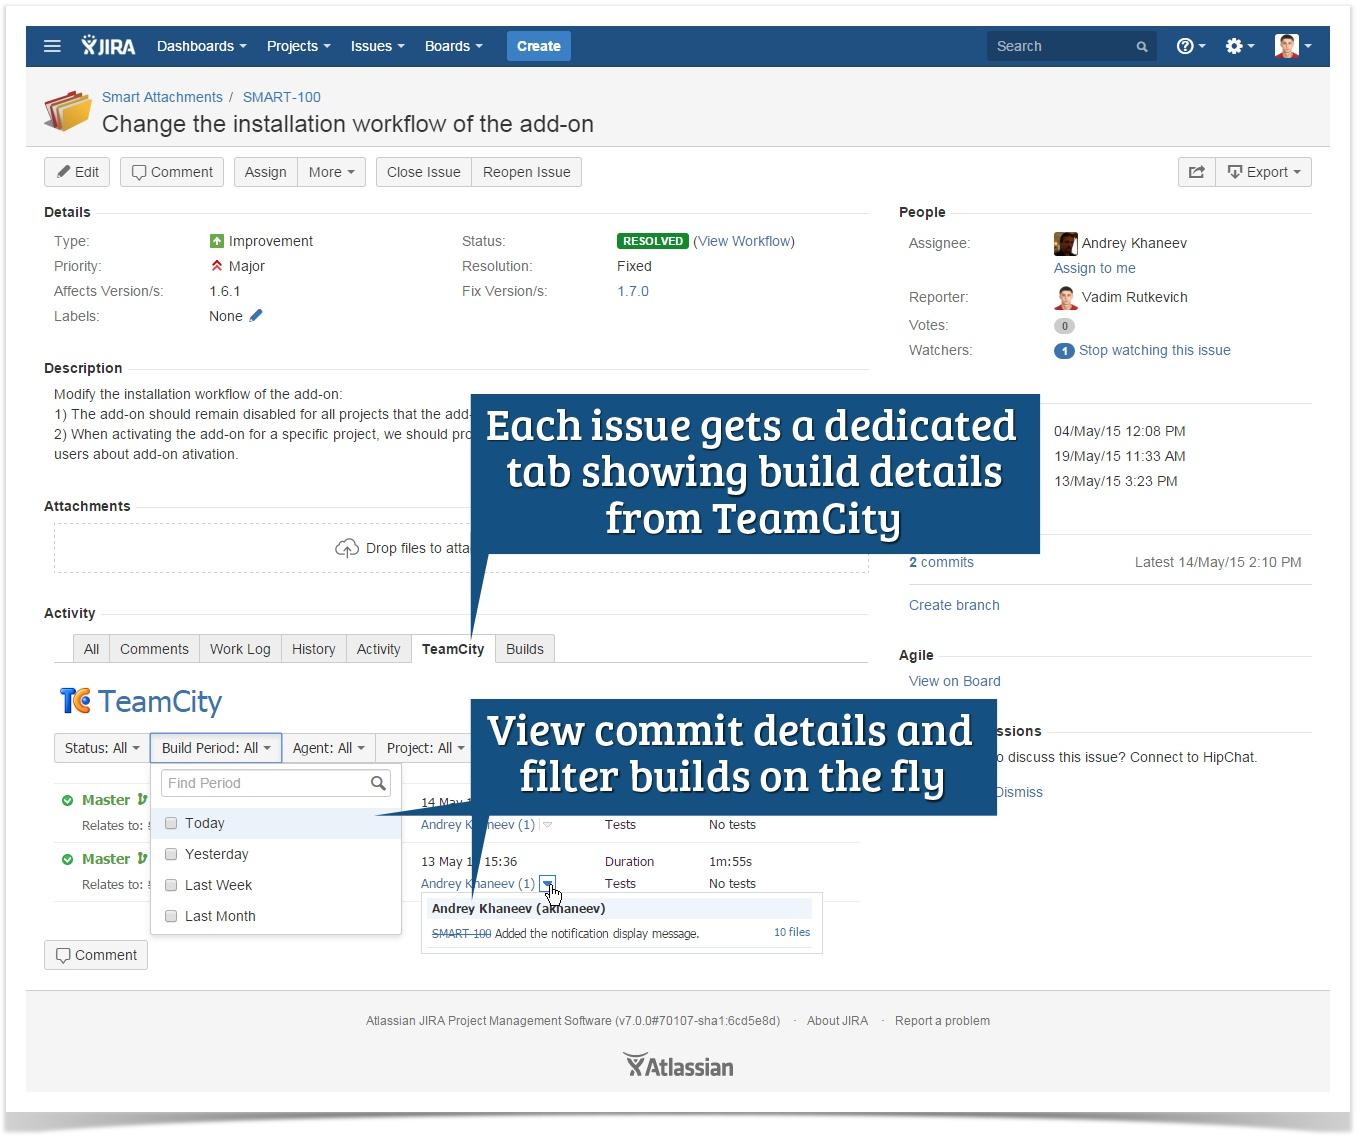 8_jira_teamcity_build_data_details